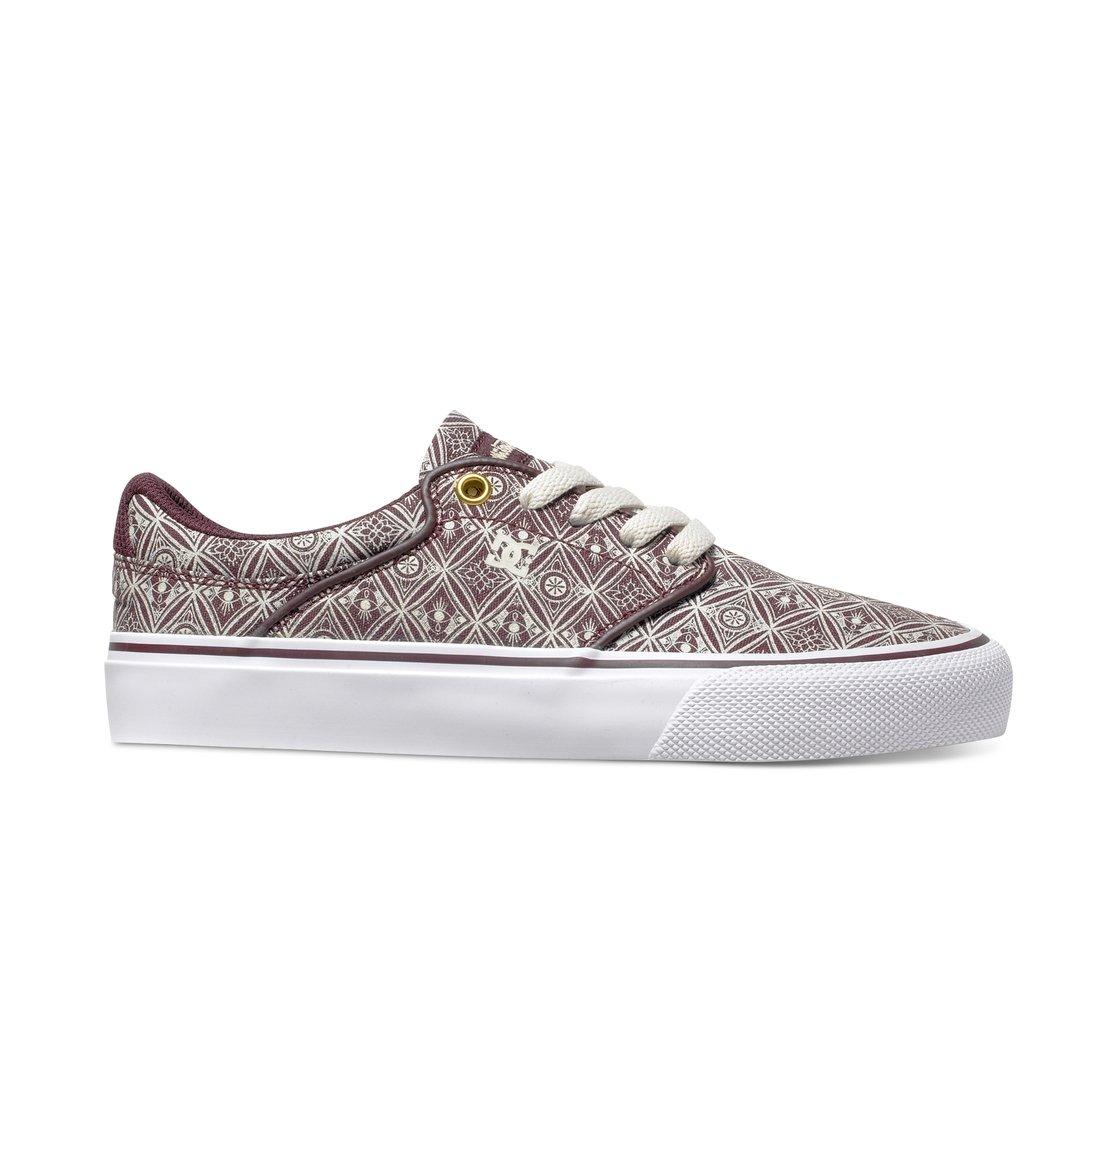 Dc Shoes Mikey Taylor 2 S Zapatillas De Caña Baja, Color: Grey/Black, Size: 39 EU (7 US / 6 UK)